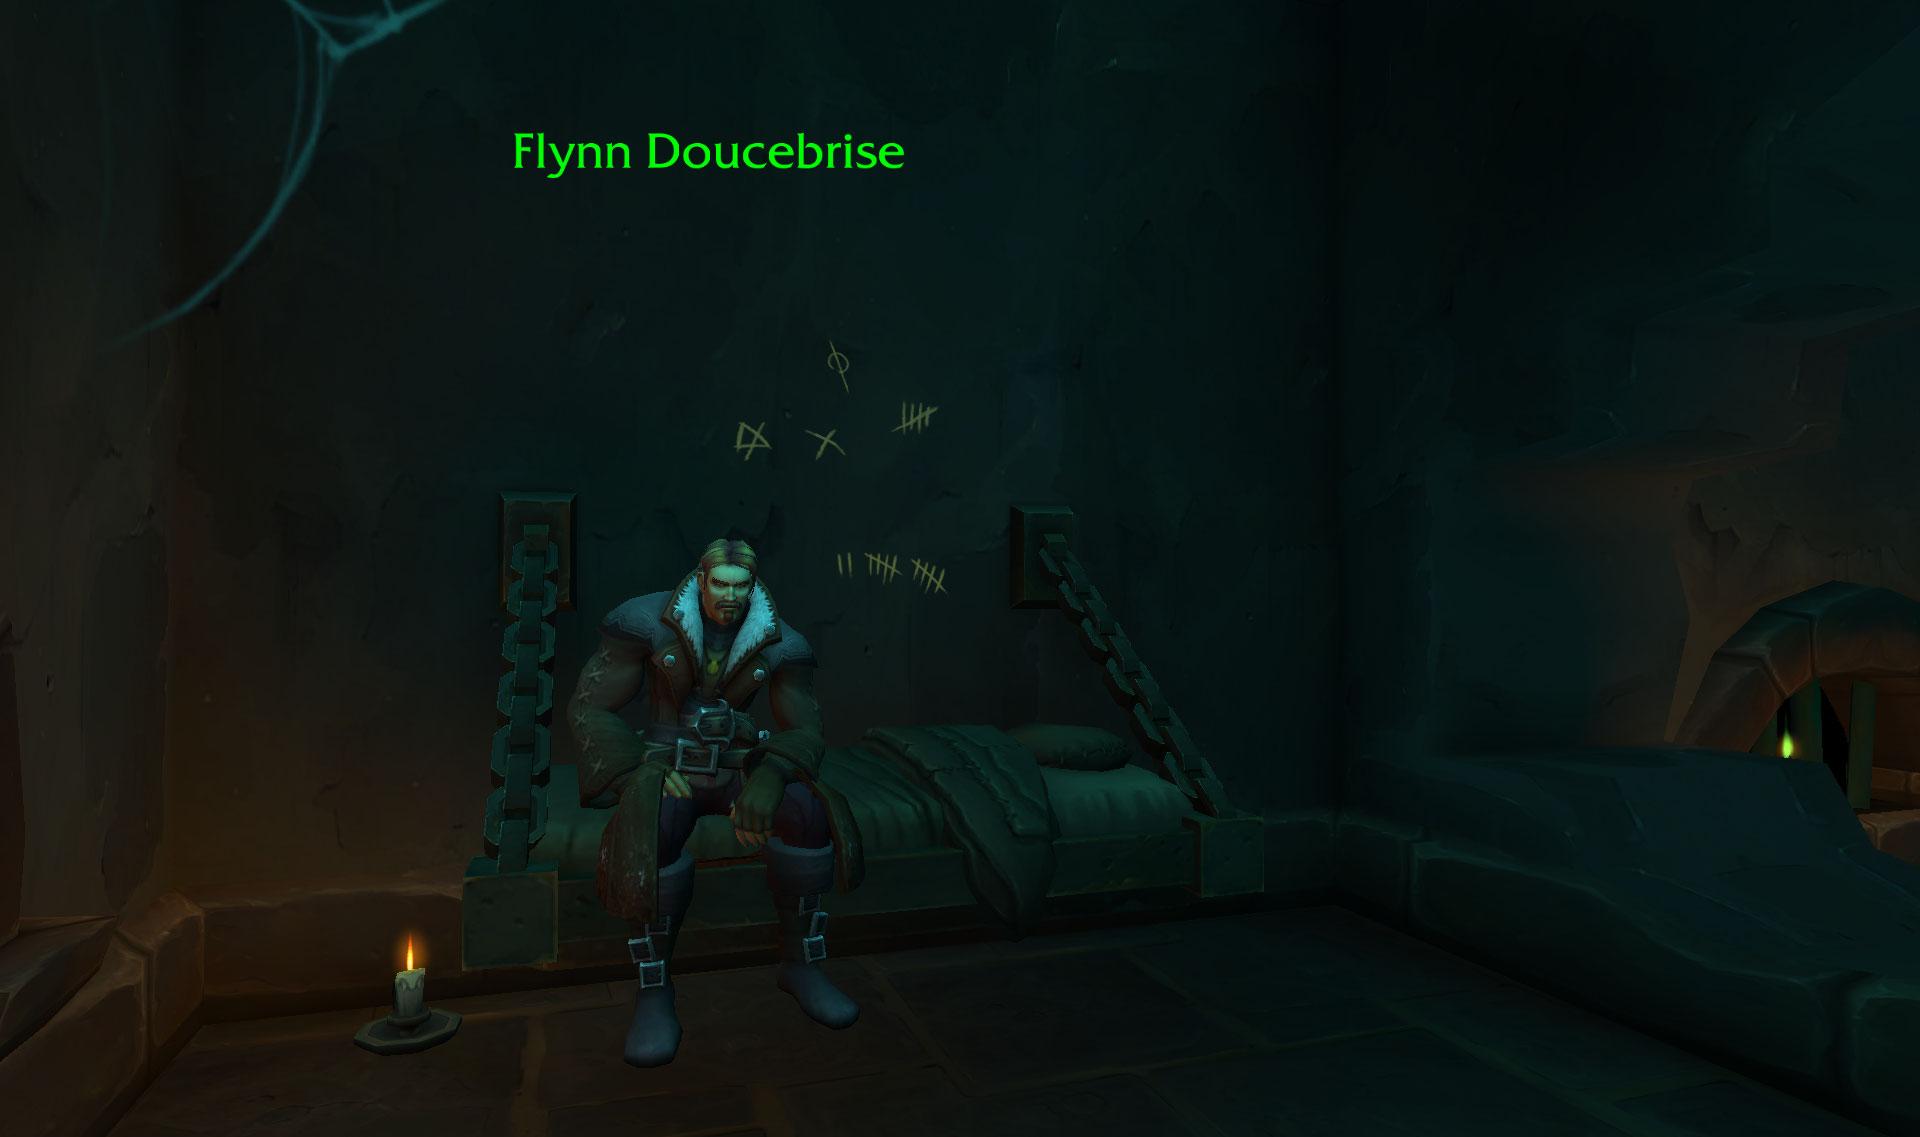 Screenshot du scénario d'introduction de l'Alliance dans World of Warcraft: Battle for Azeroth.